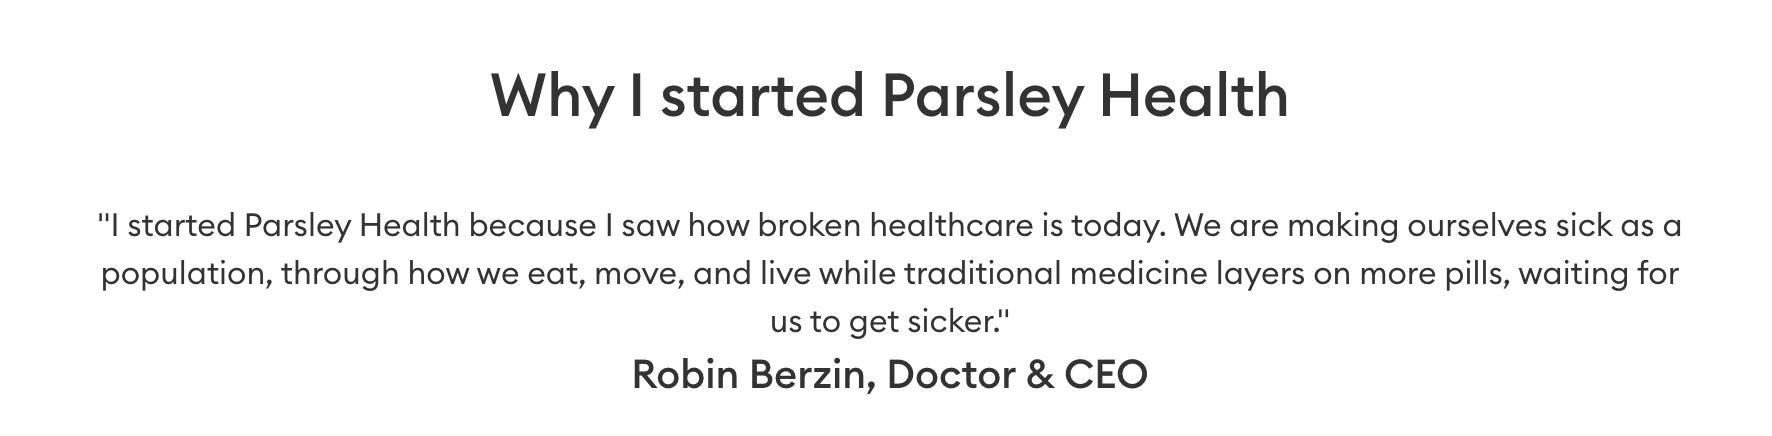 Parsley Health name